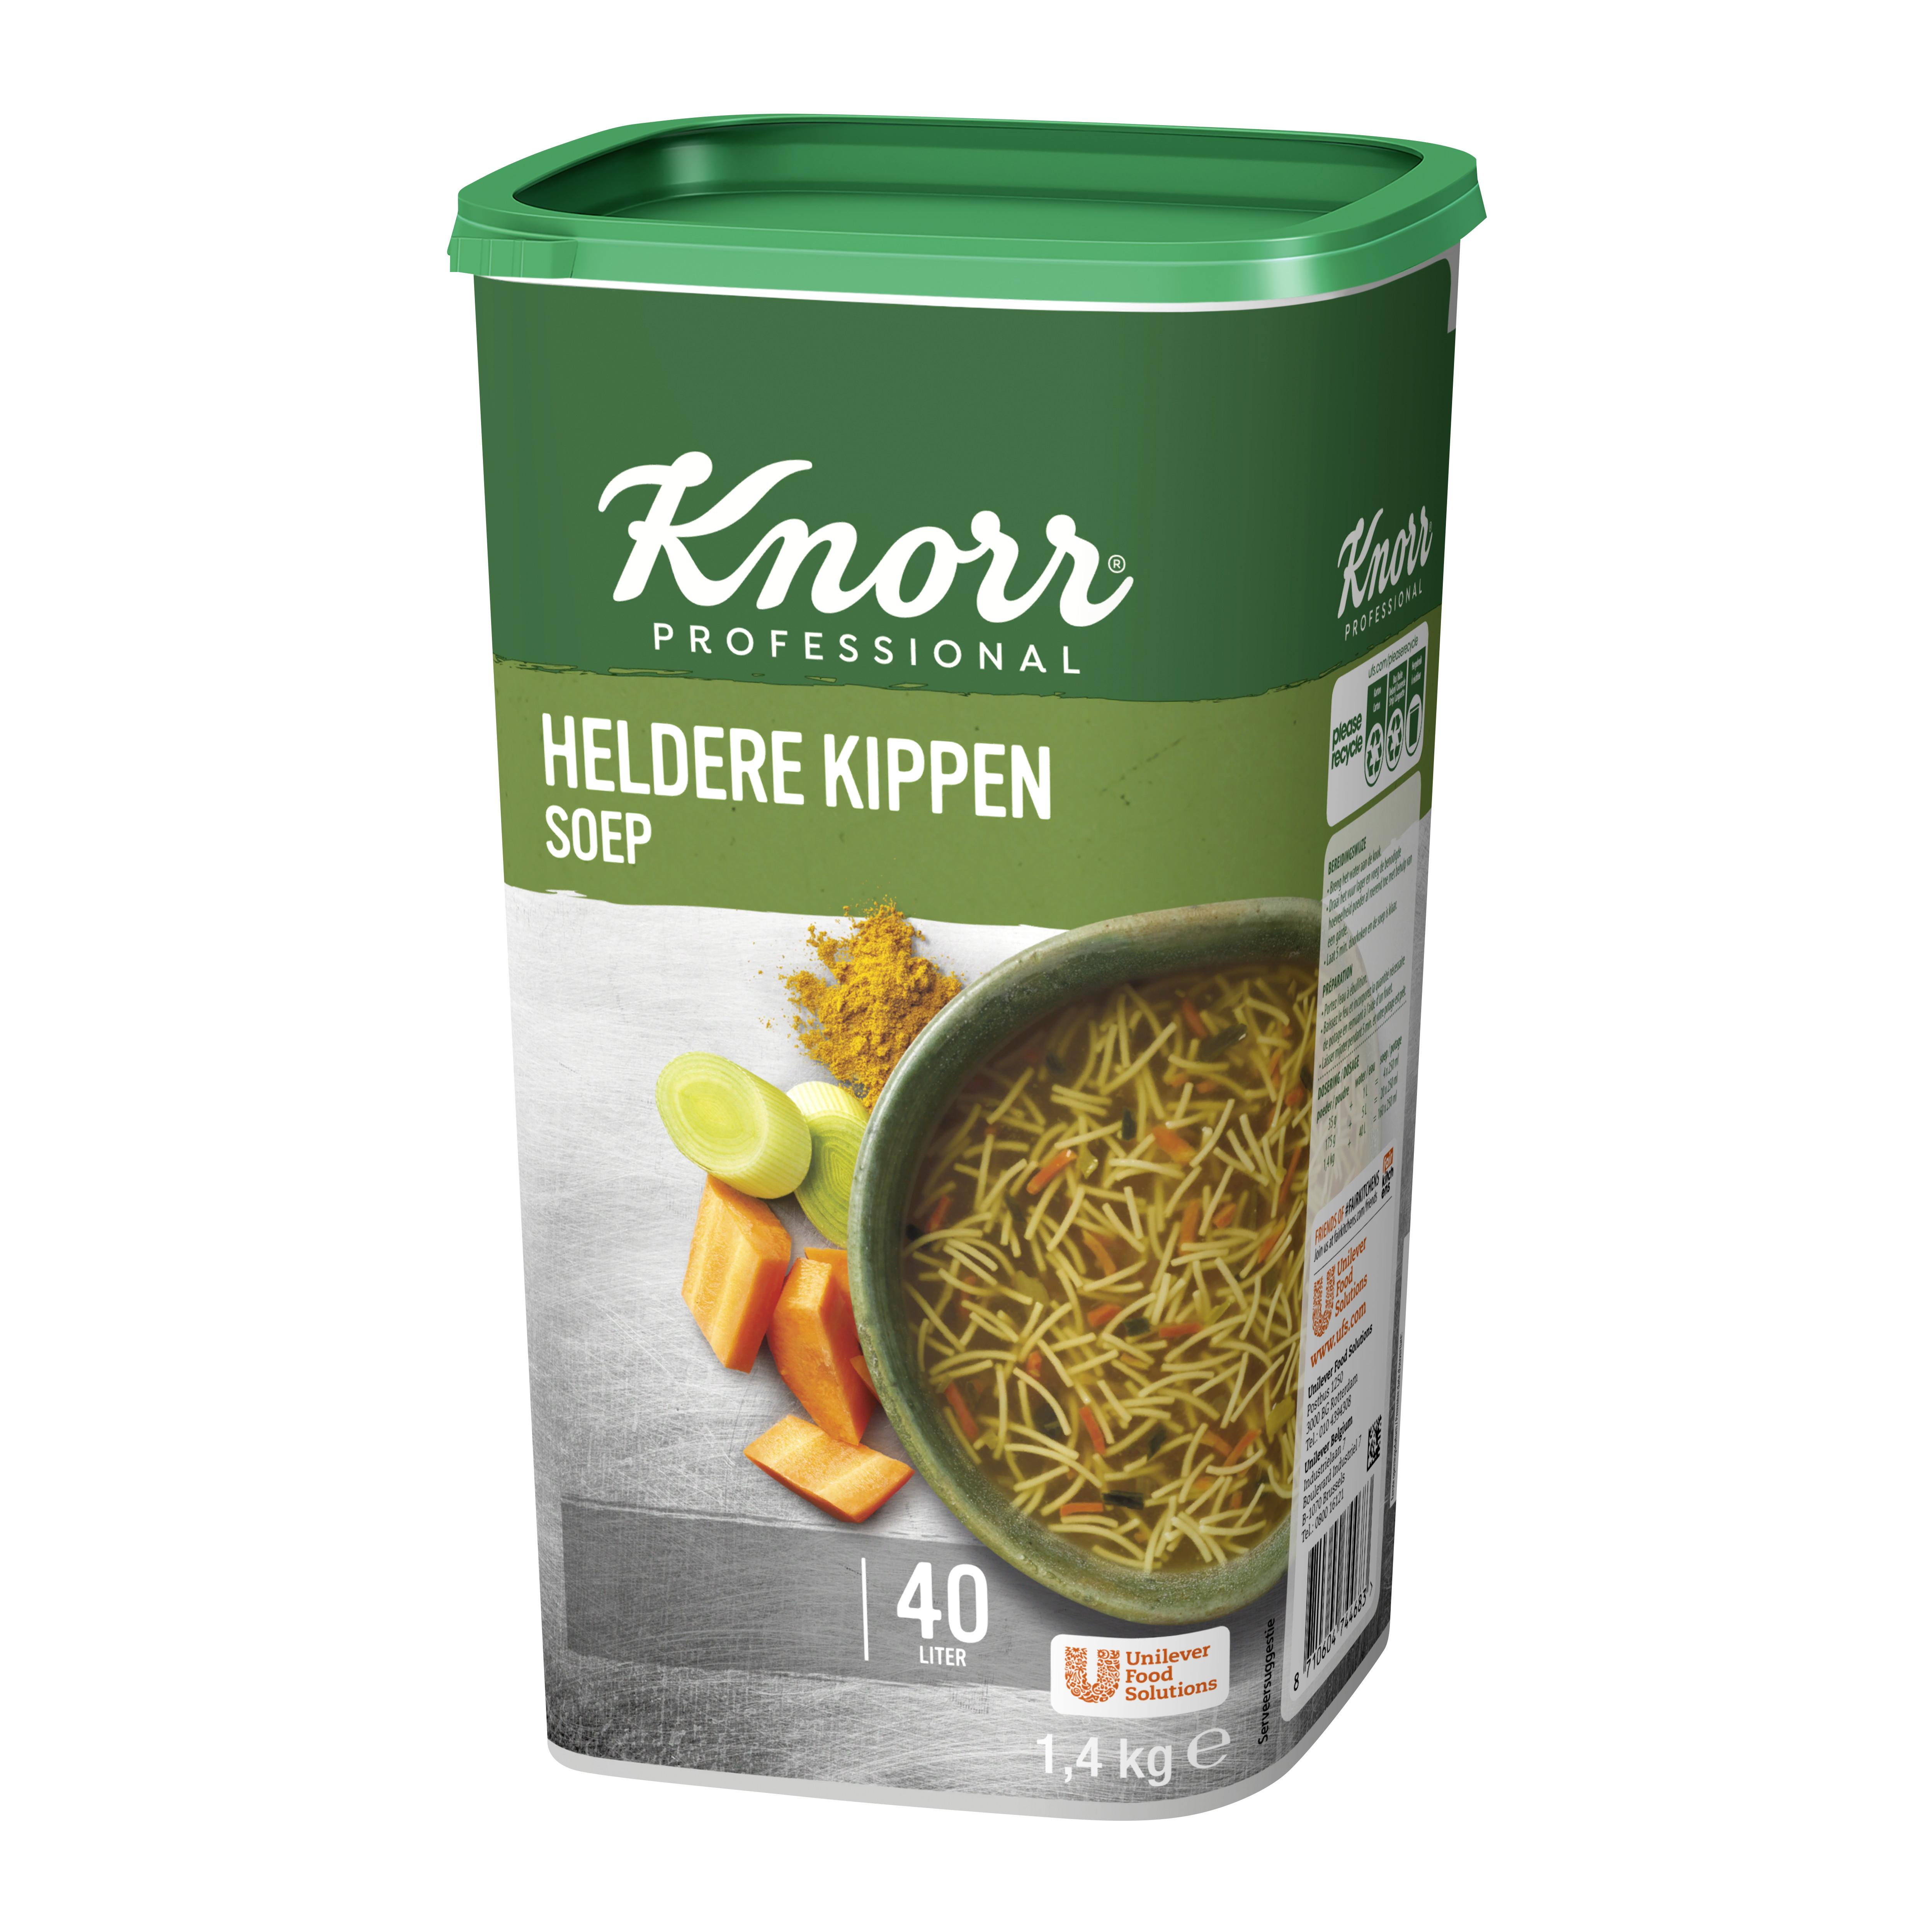 Knorr kippensoep double chicken 1.47kg dagsoep